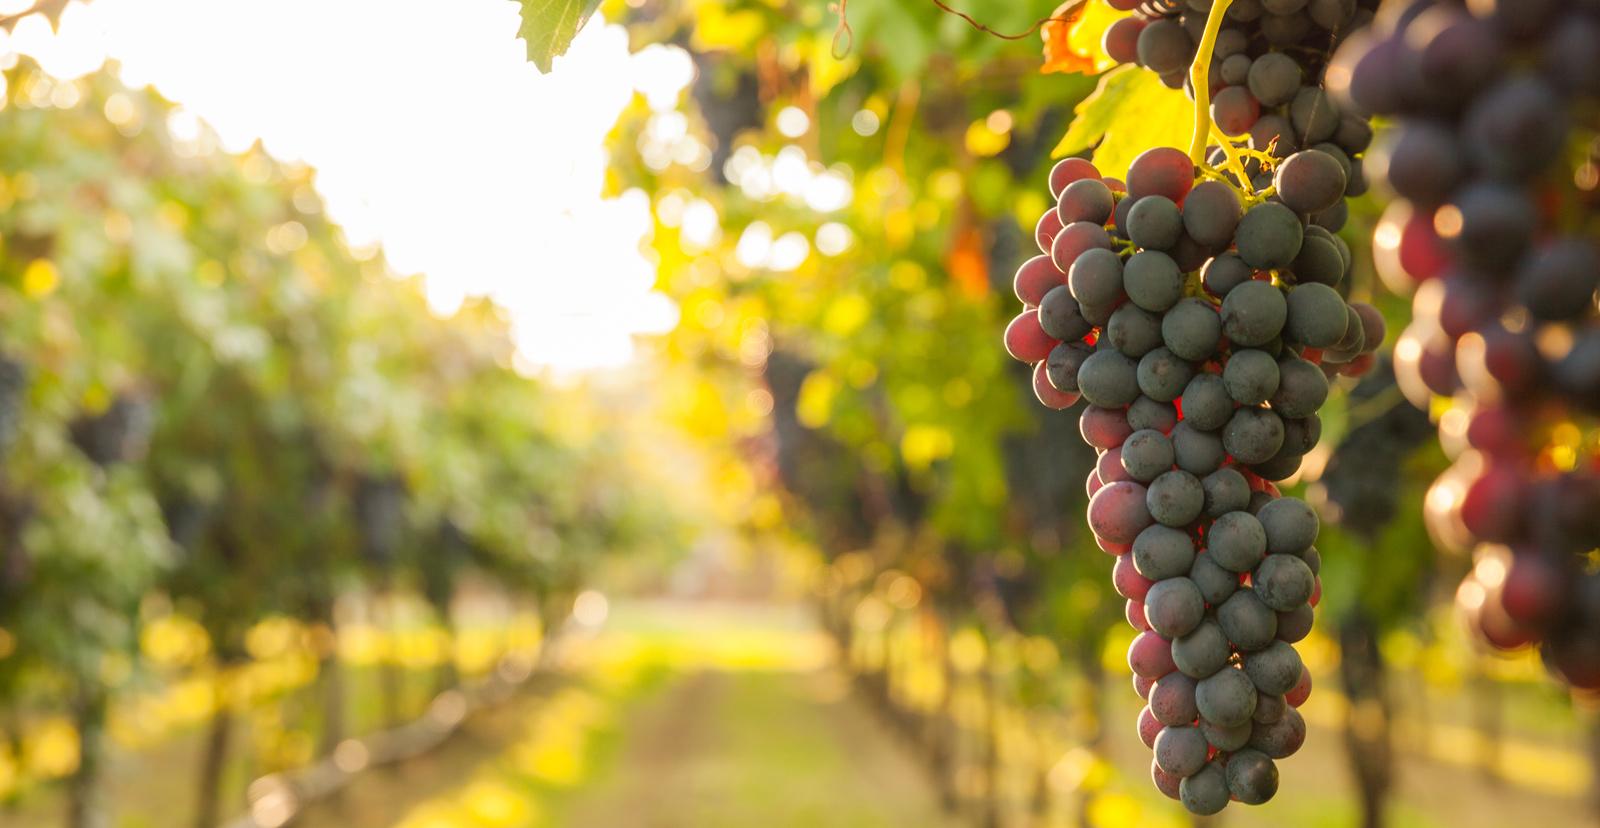 vineyard-shutterstock571565734.jpg